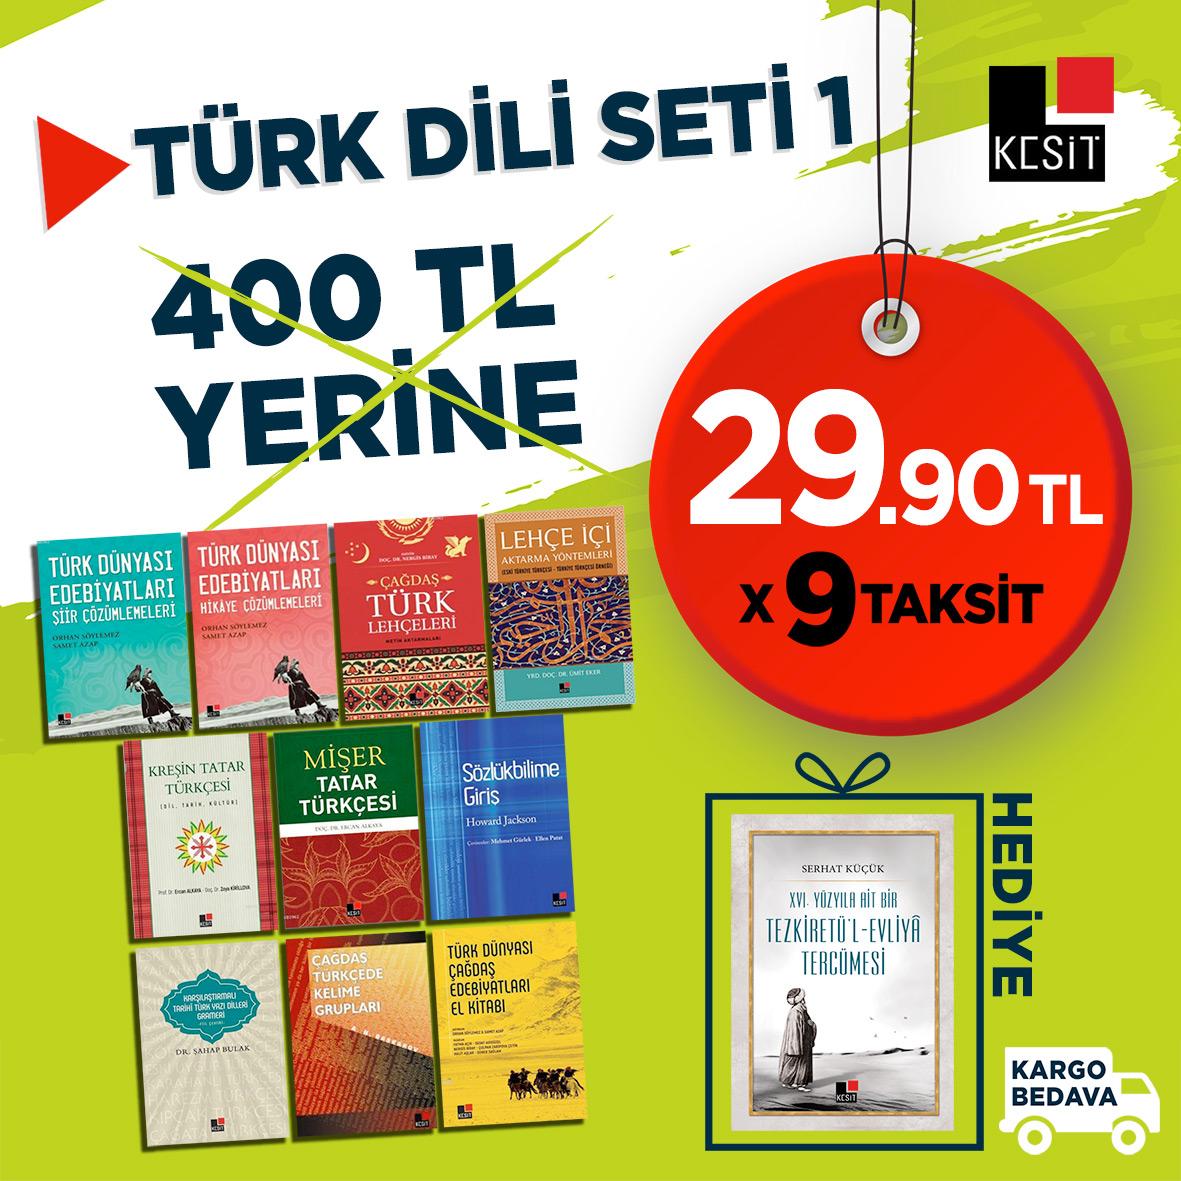 Türk Dili Seti 1